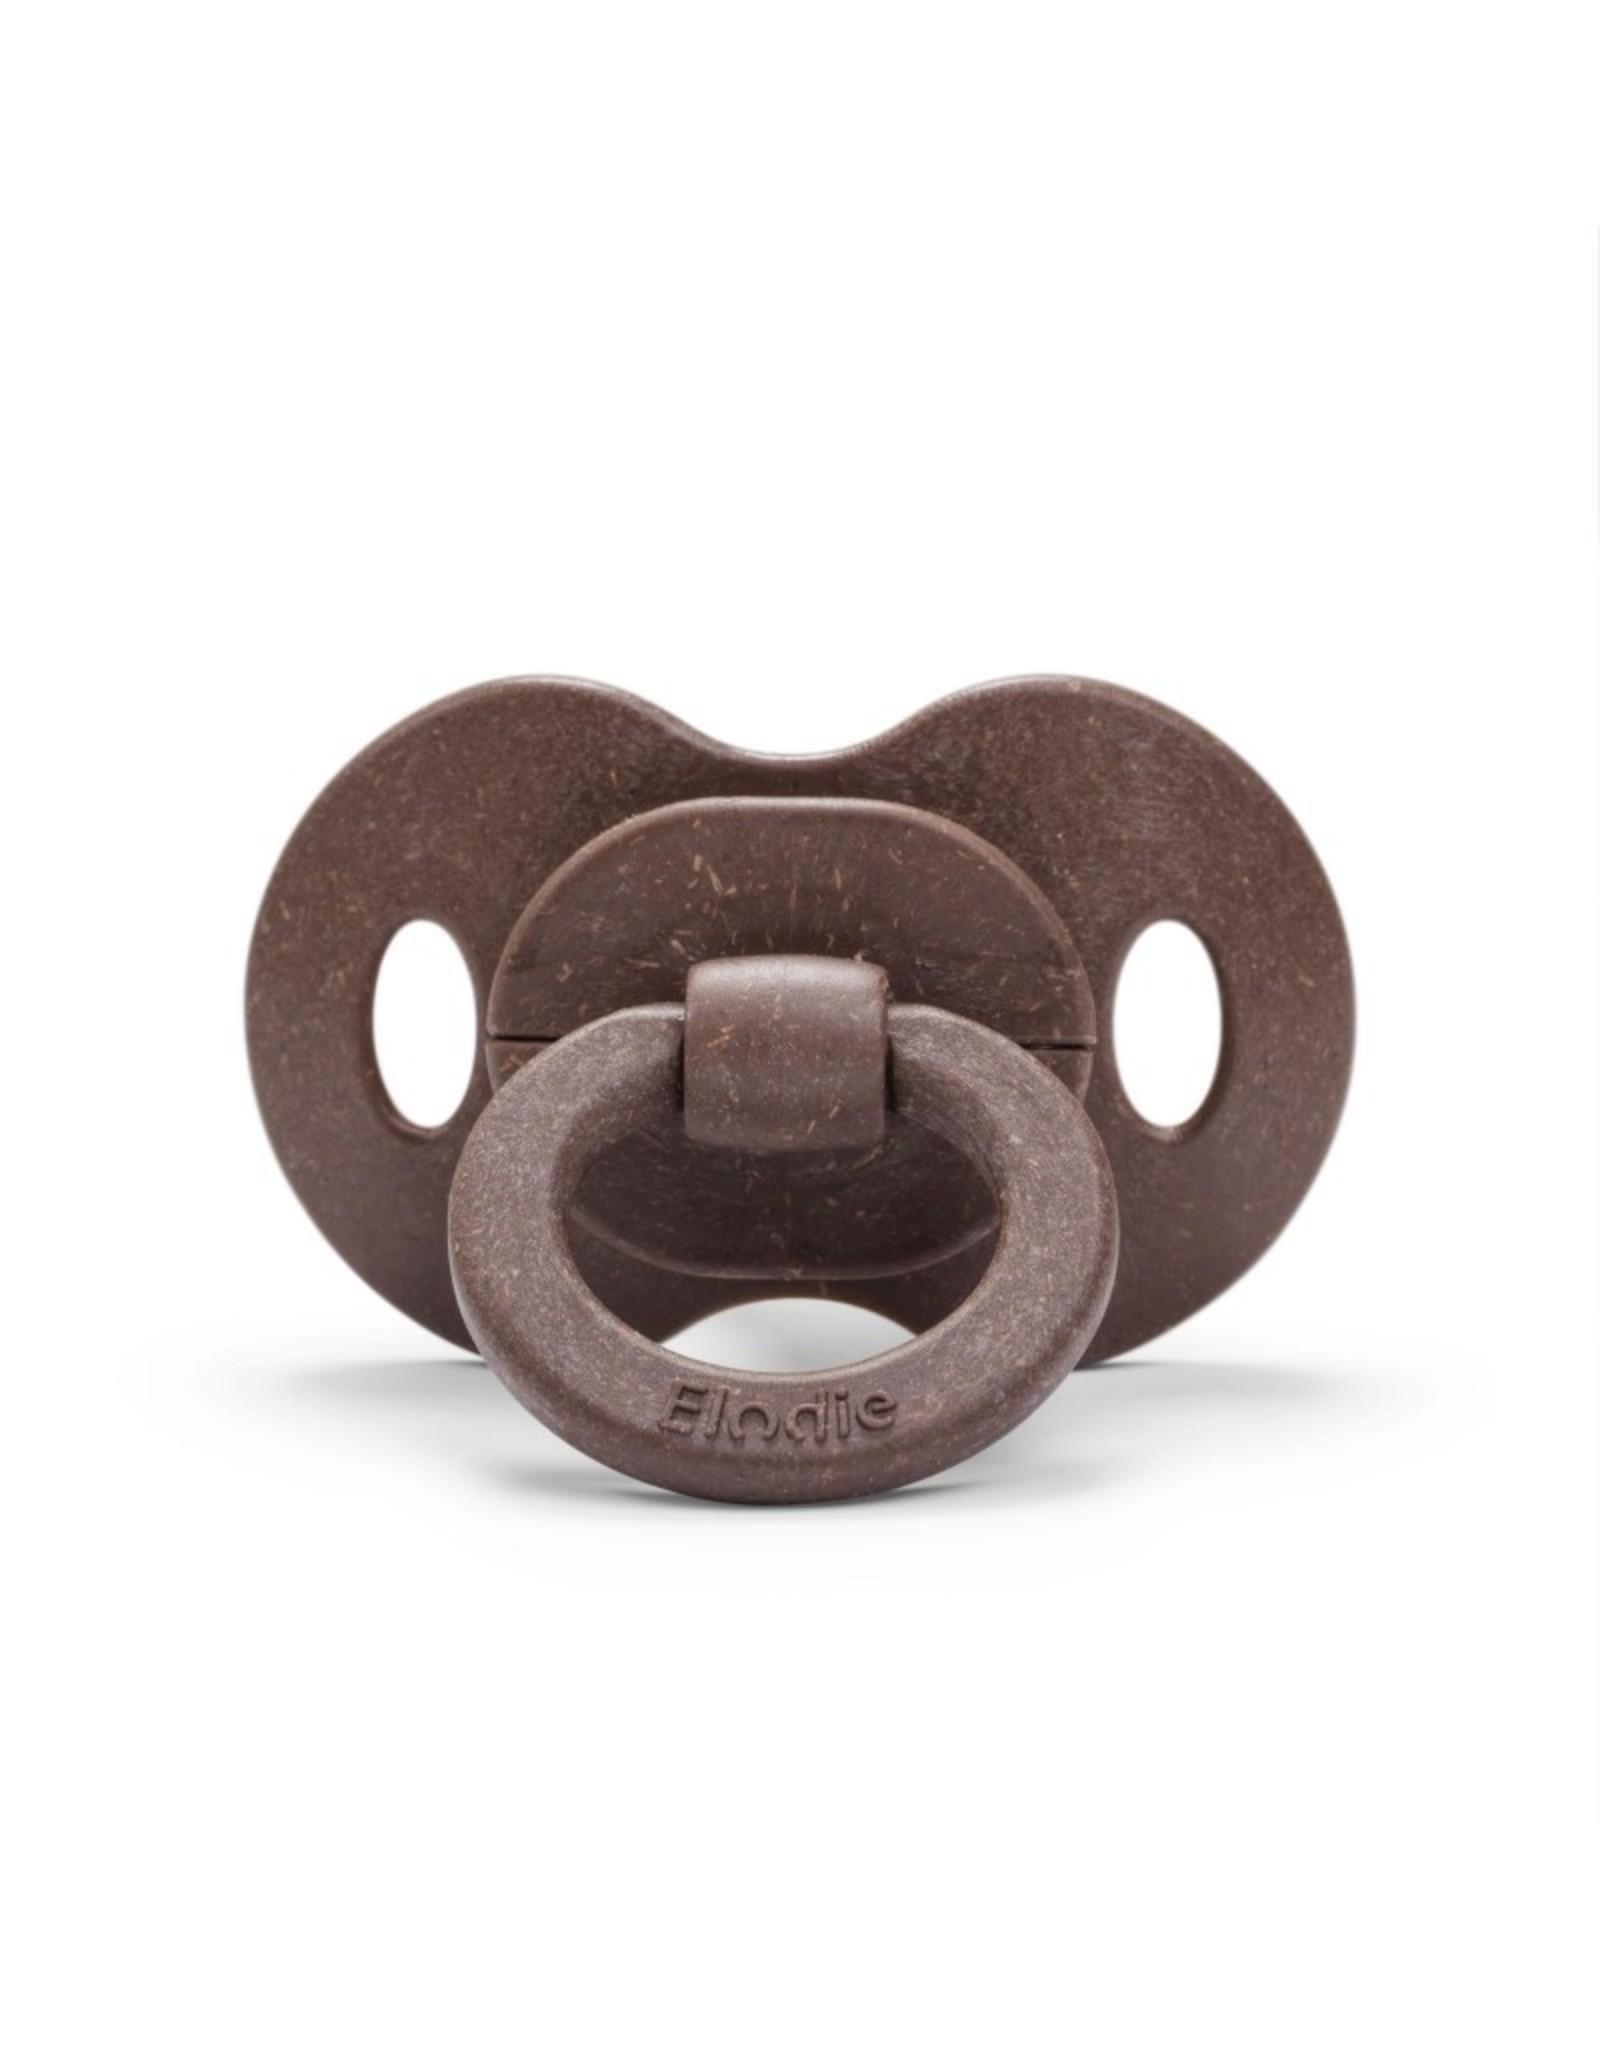 Elodie Details Tétine en bambou - Chocolate